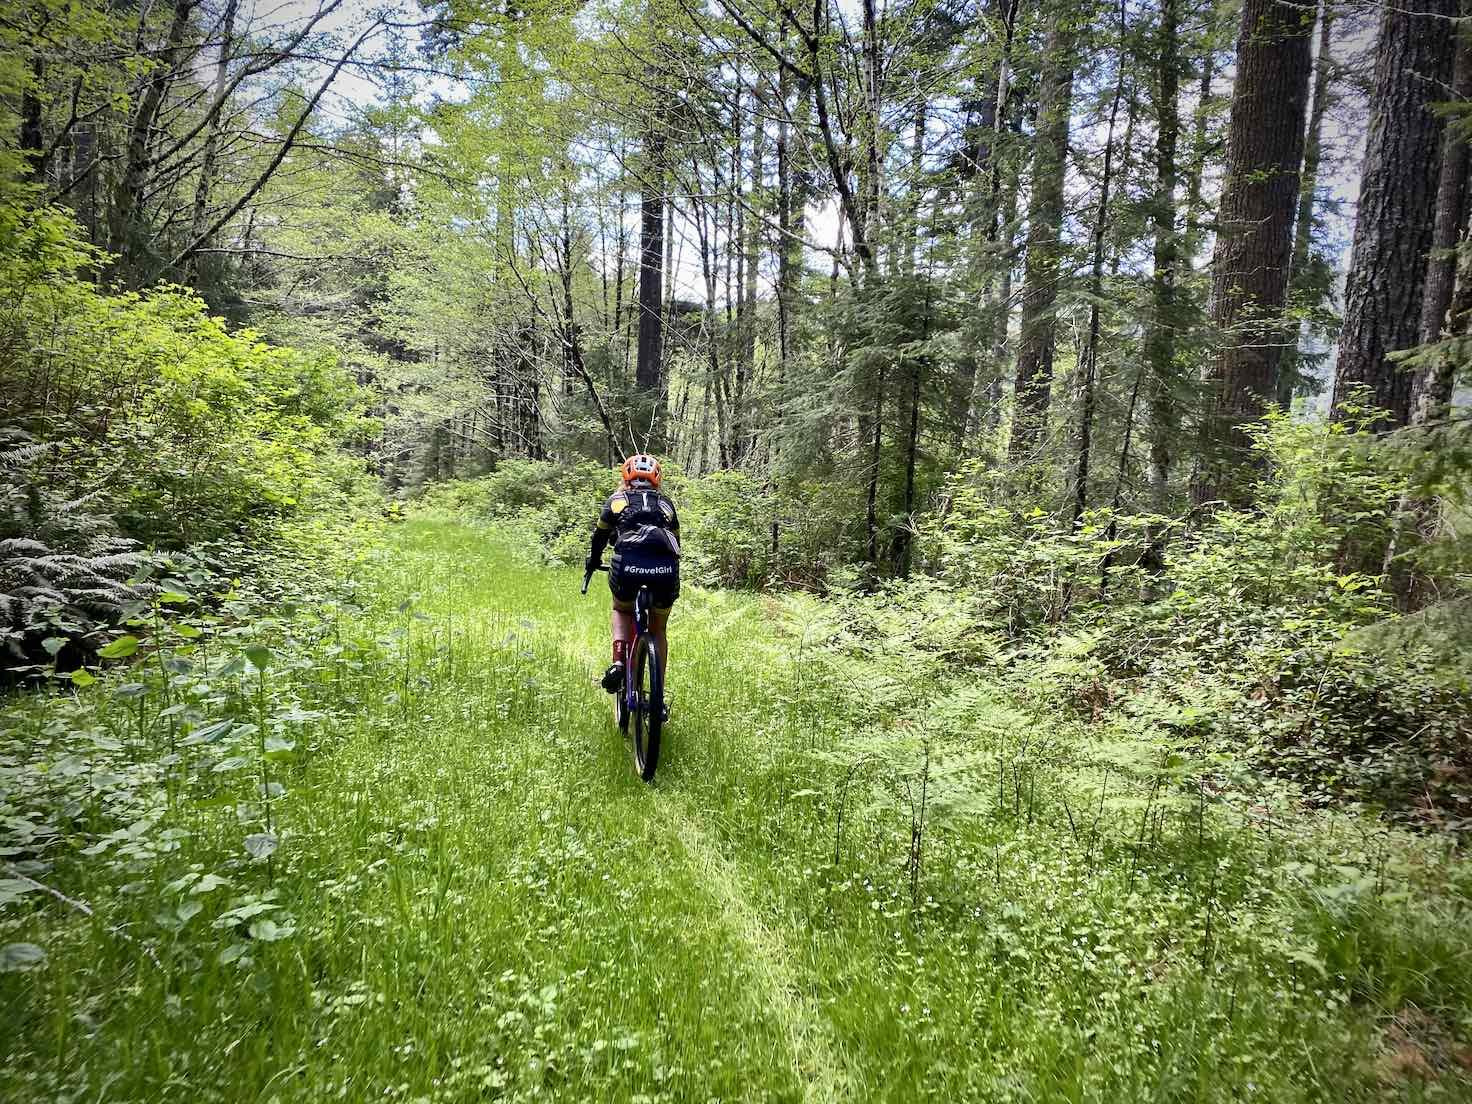 Gravel Girl riding the C2C trail, deep grassy.